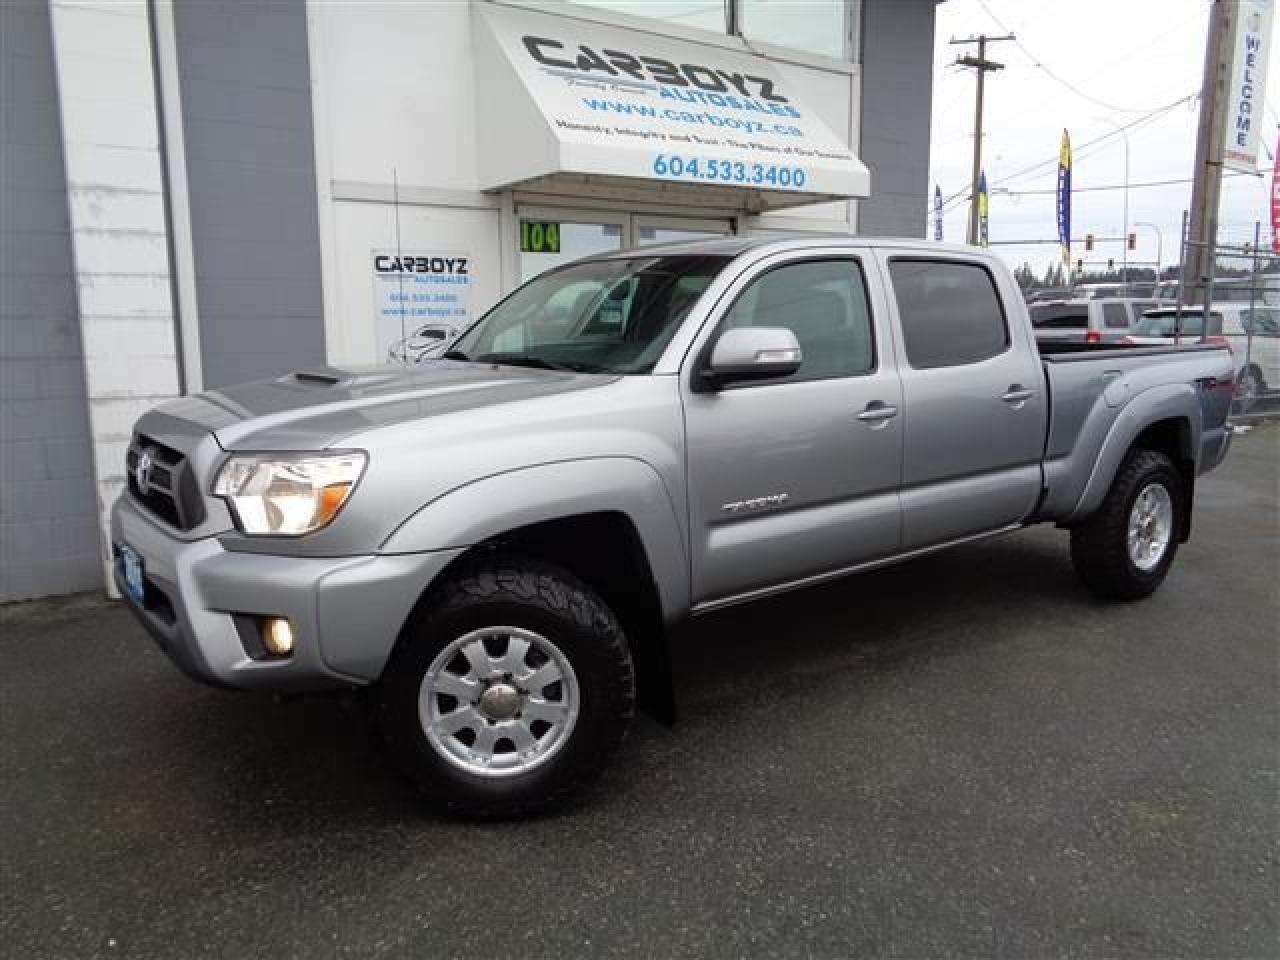 2015 Toyota Tacoma TRD Sport Premium, Double Cab, Nav, Leather